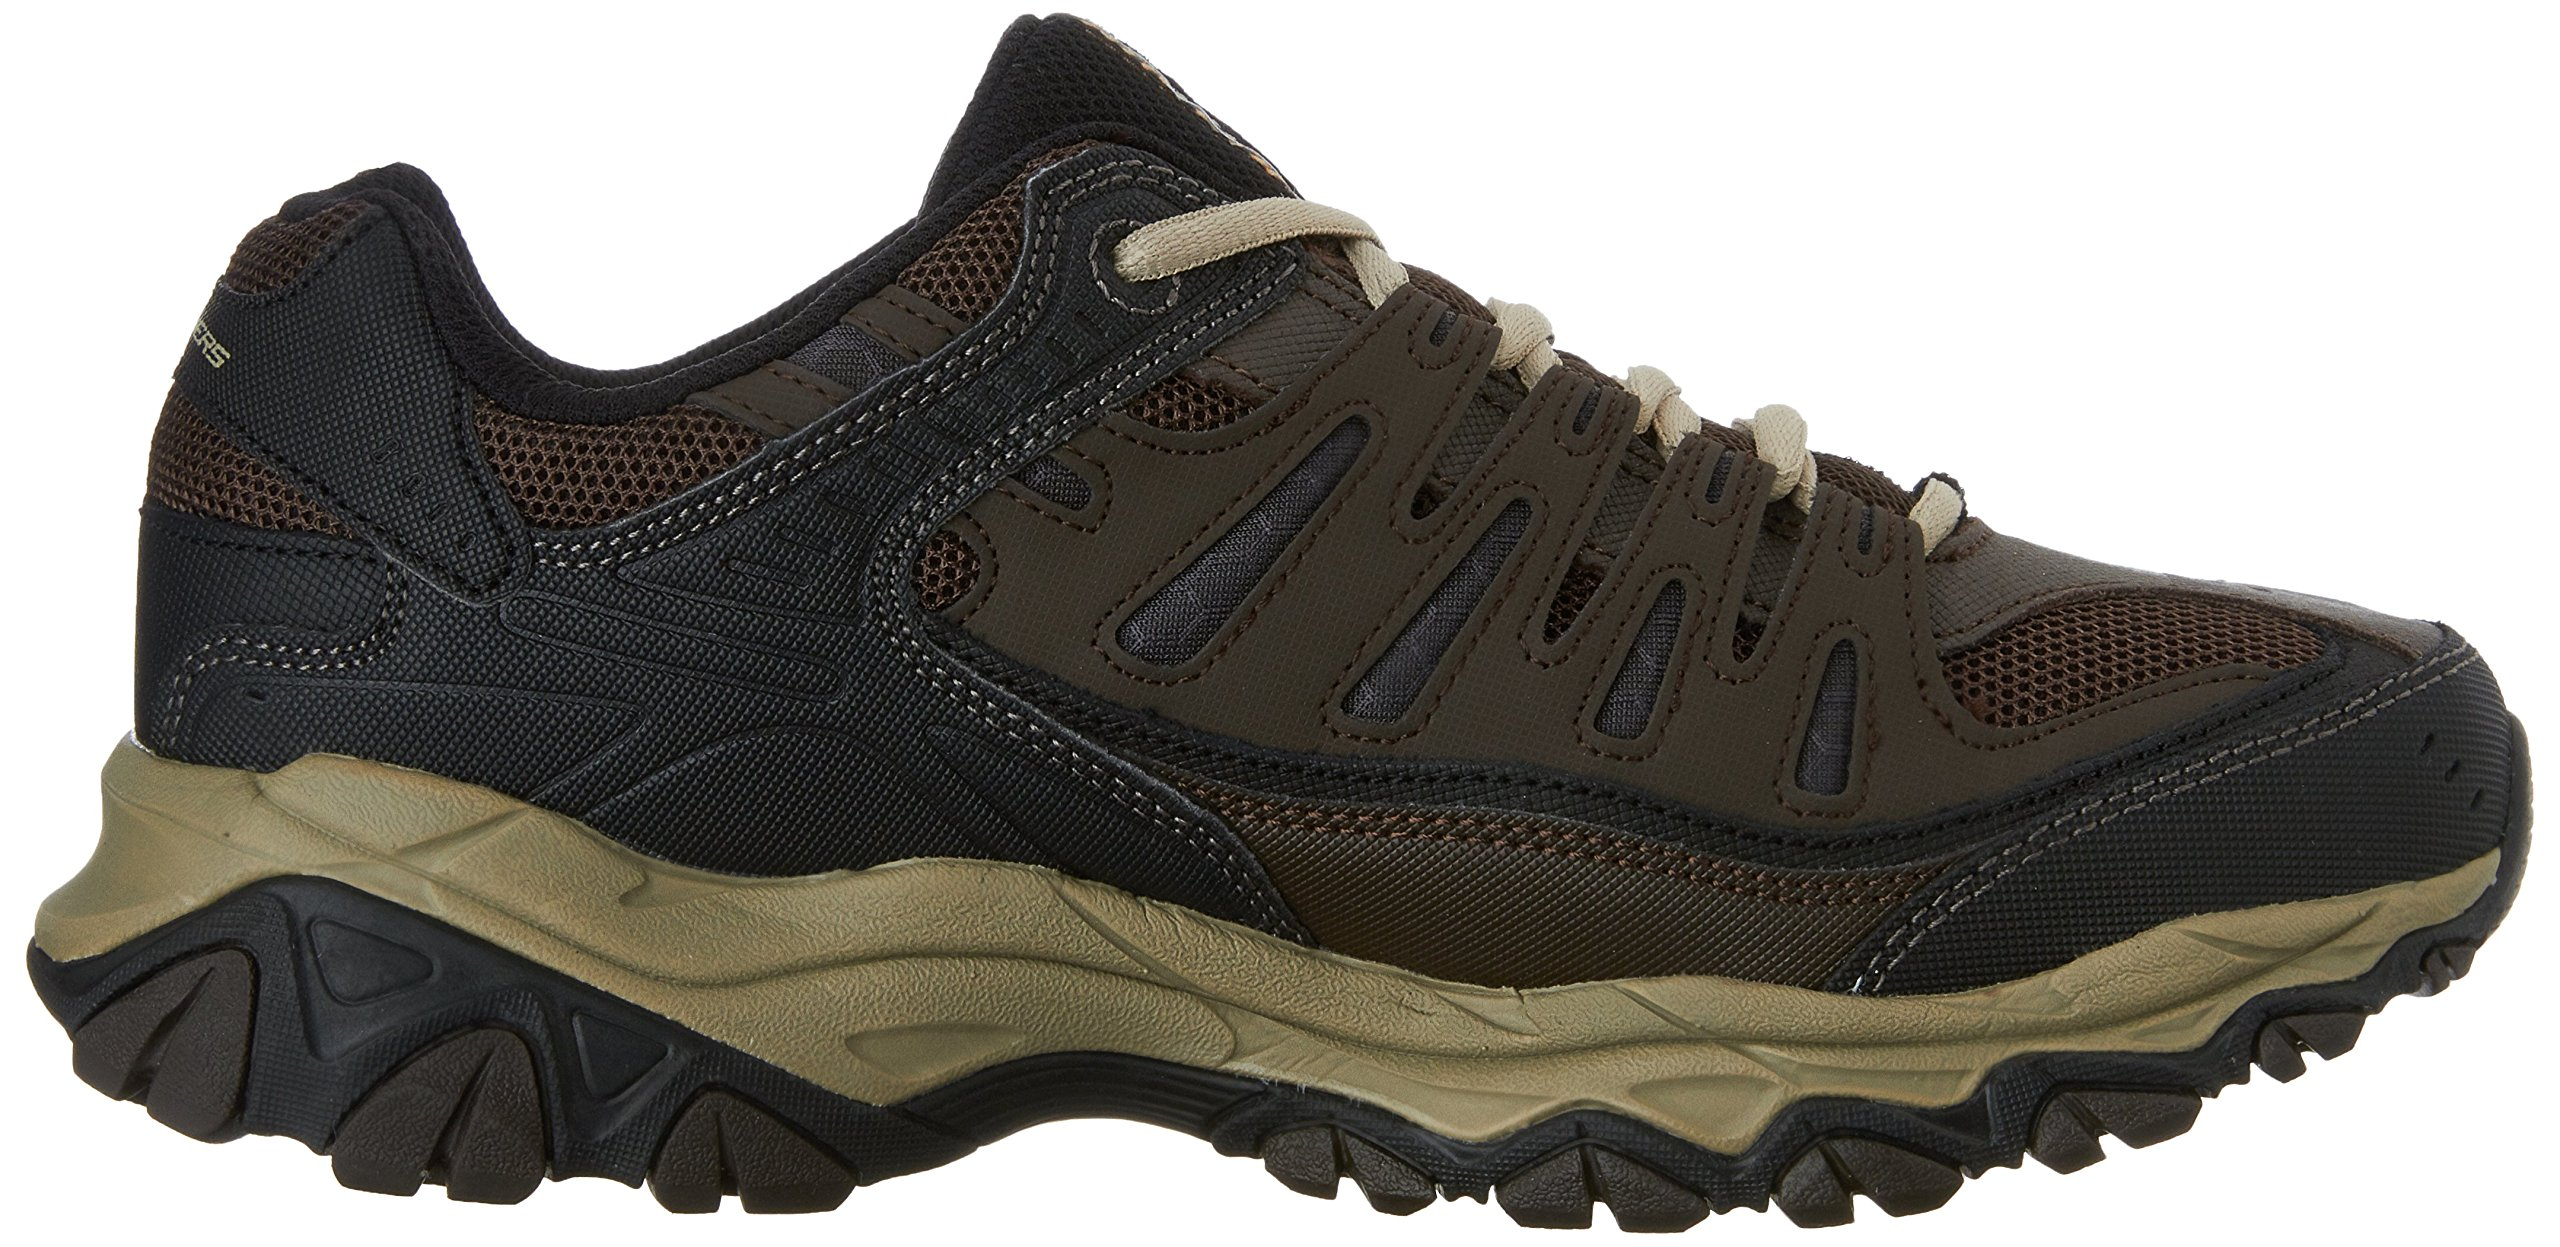 Skechers Men's AFTERBURNM.FIT Memory Foam Lace-Up Sneaker, Brown/Taupe, 7 M US by Skechers (Image #7)